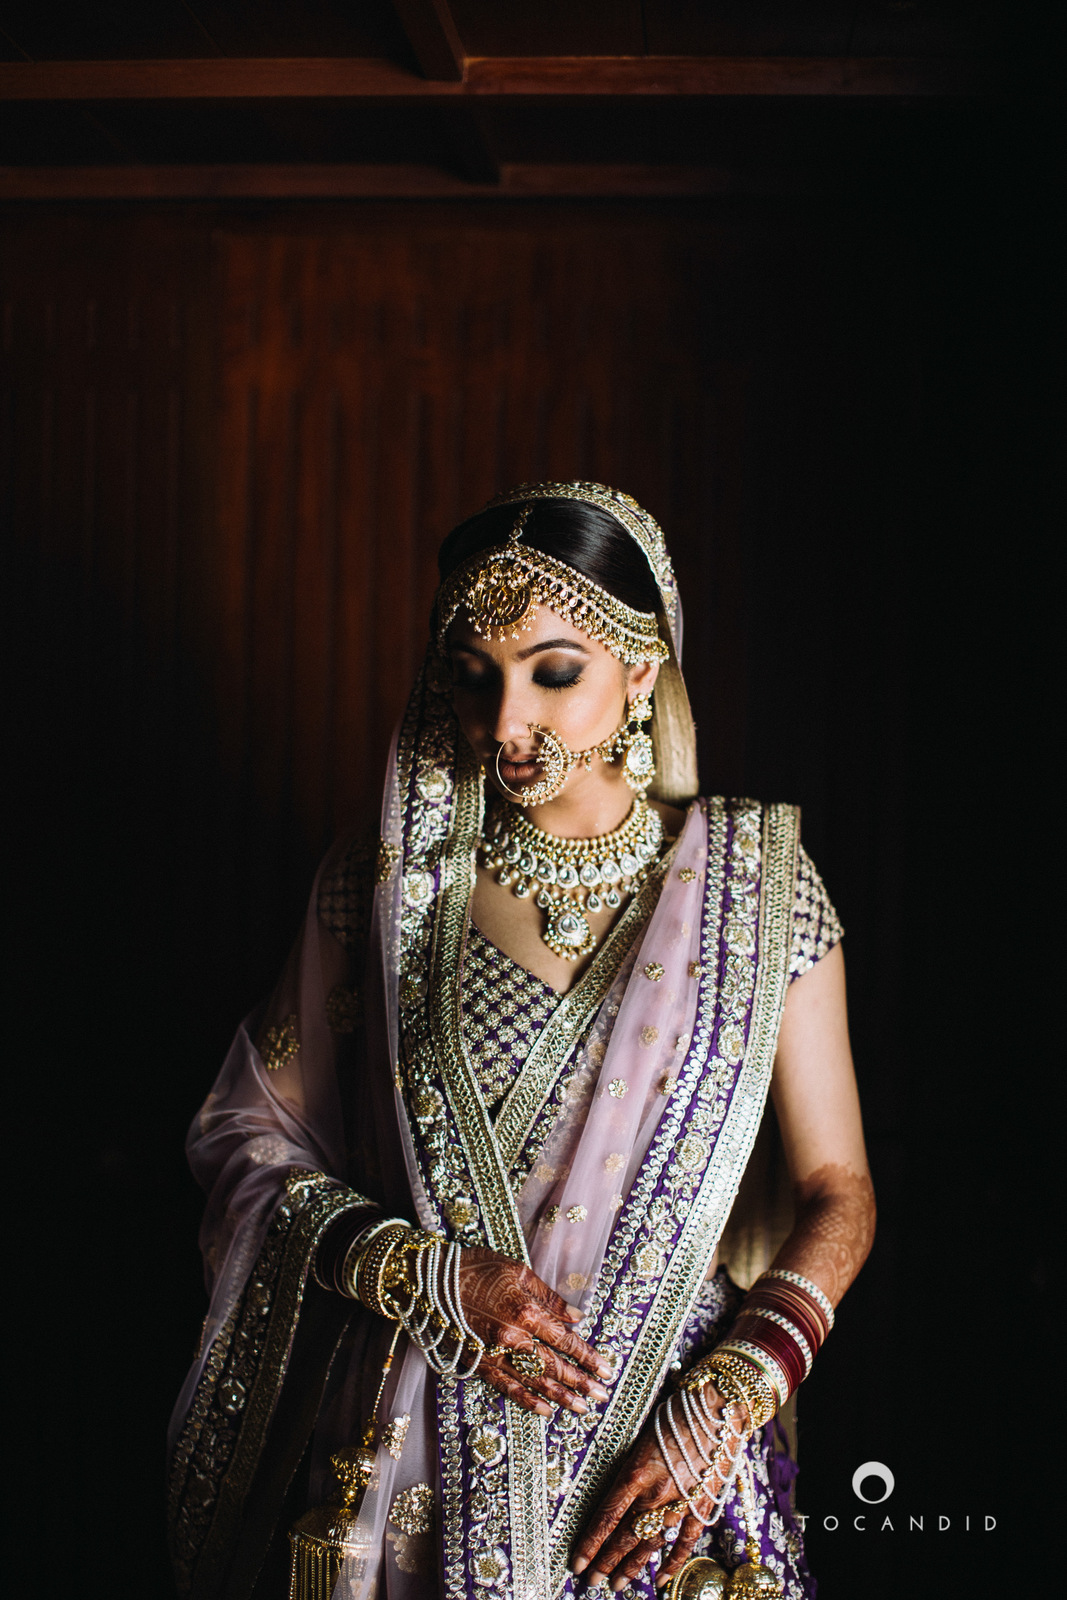 leela-kovalam-wedding-destination-indian-wedding-photography-intocandid-ra-31.jpg